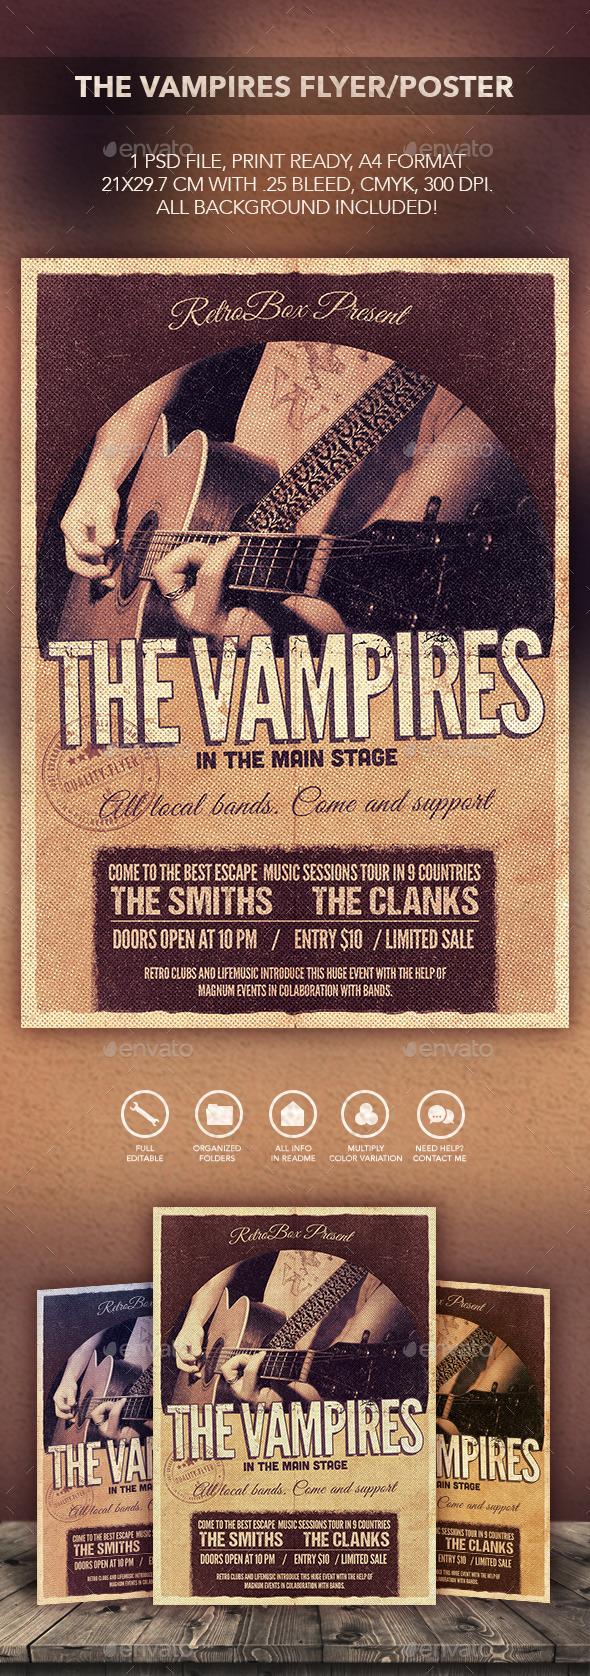 Vampires Flyer Poster - Flyers Print Templates